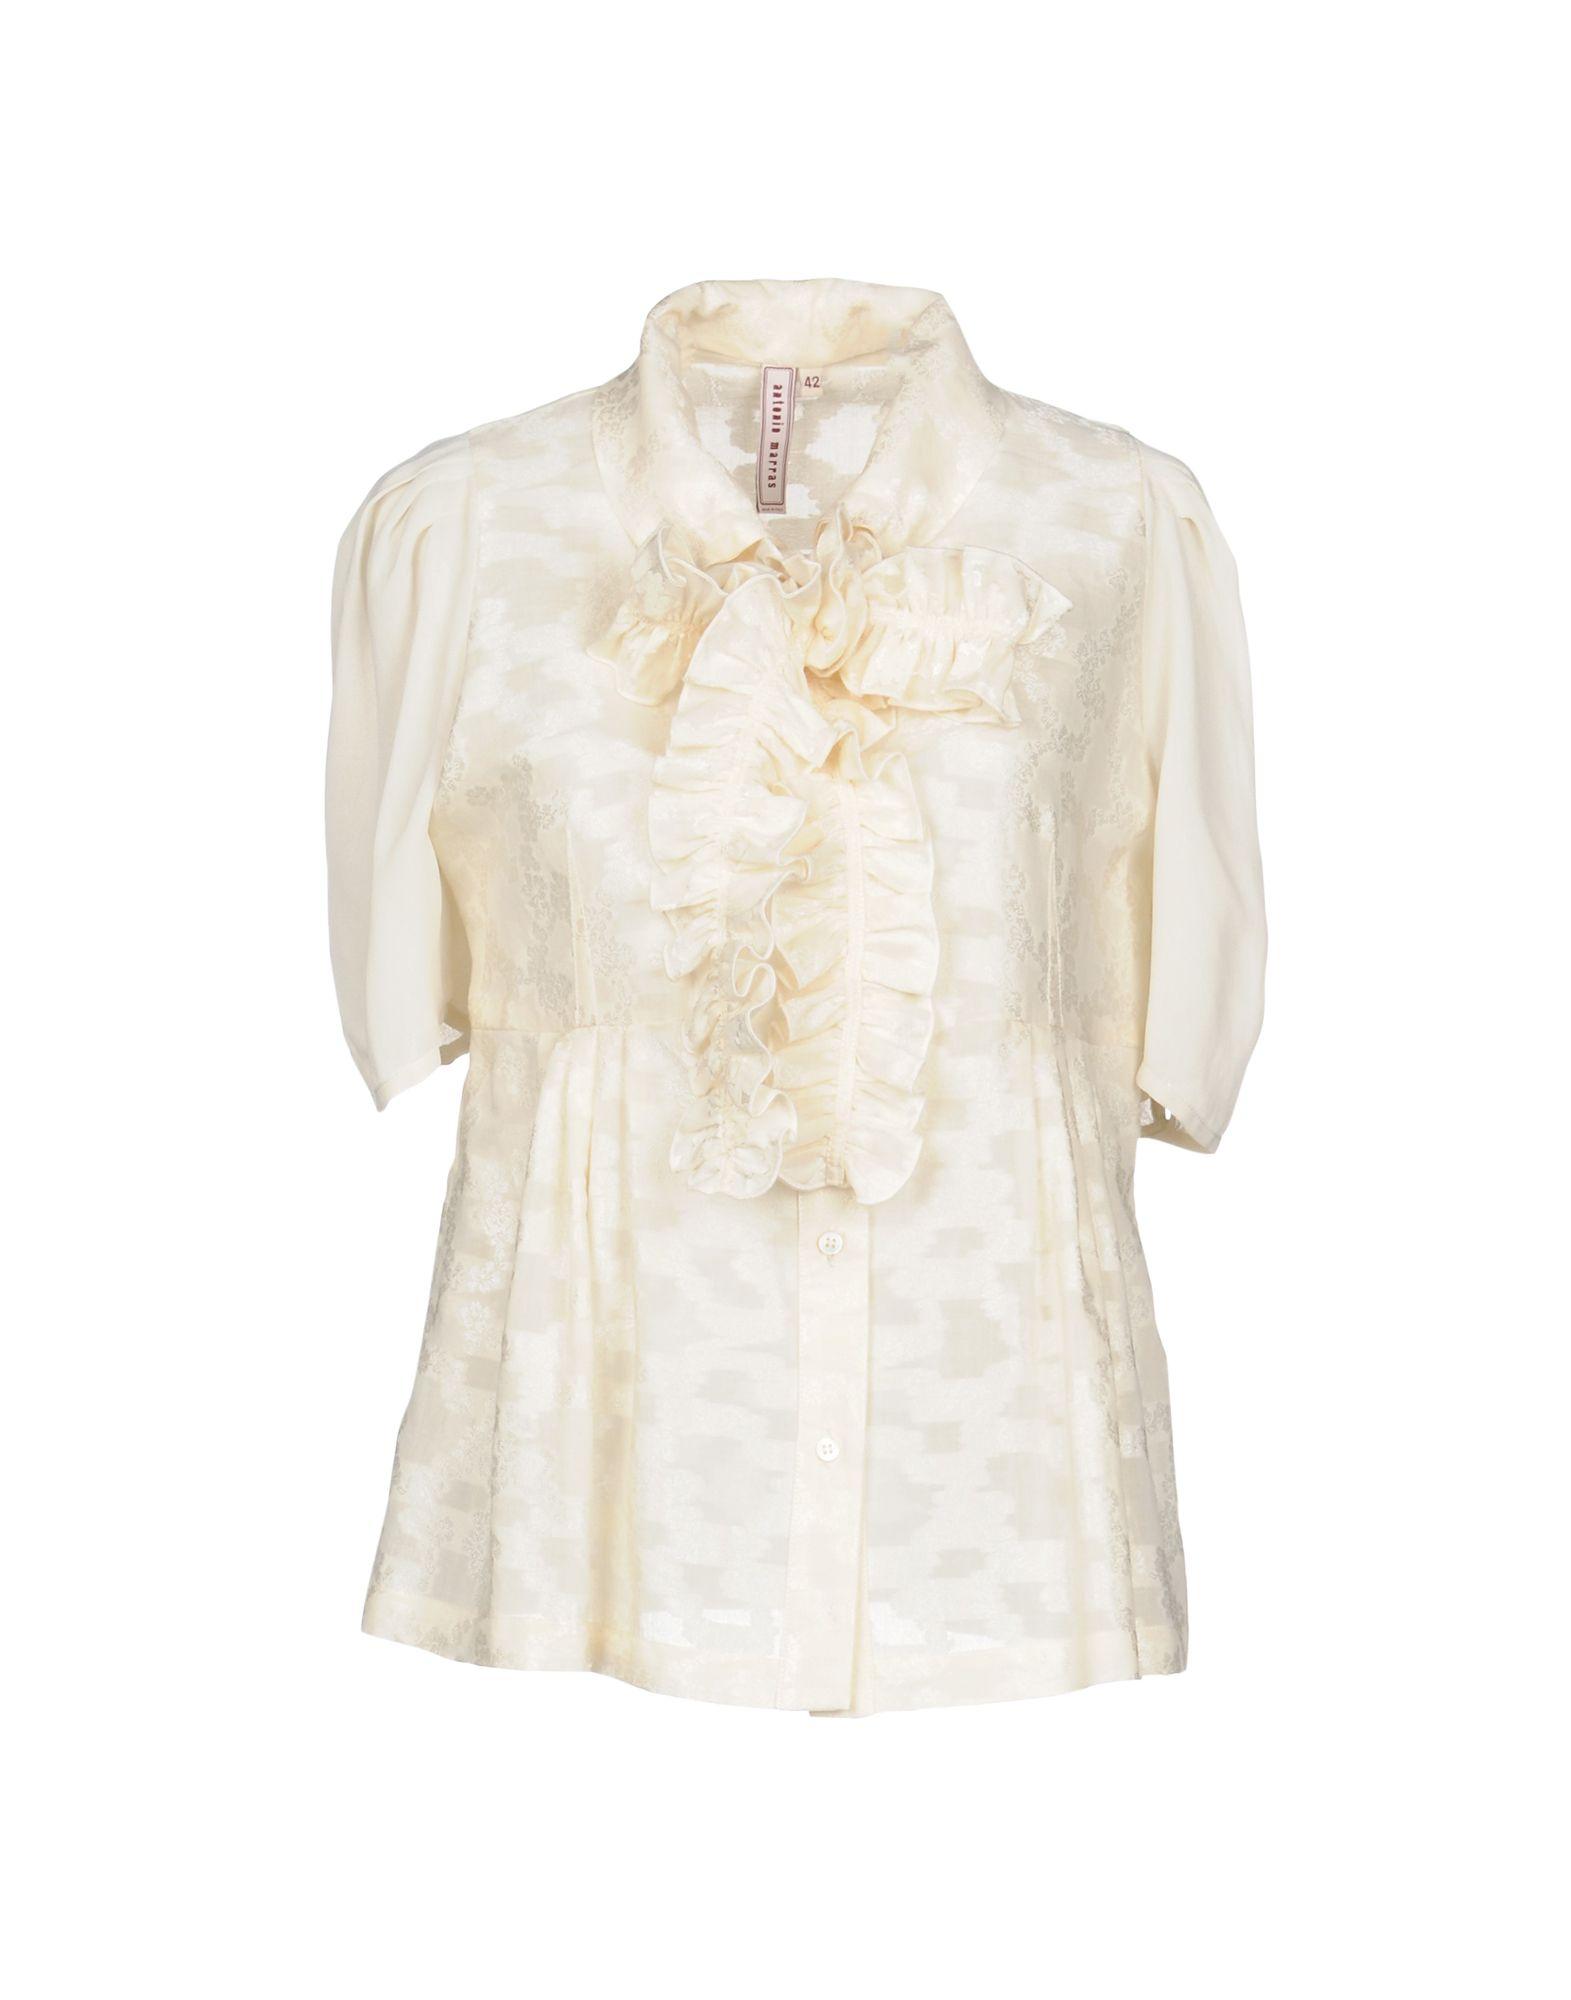 Camicie E Bluse Tinta Unita Antonio Marras Donna - Acquista online su 9vZlkc4M